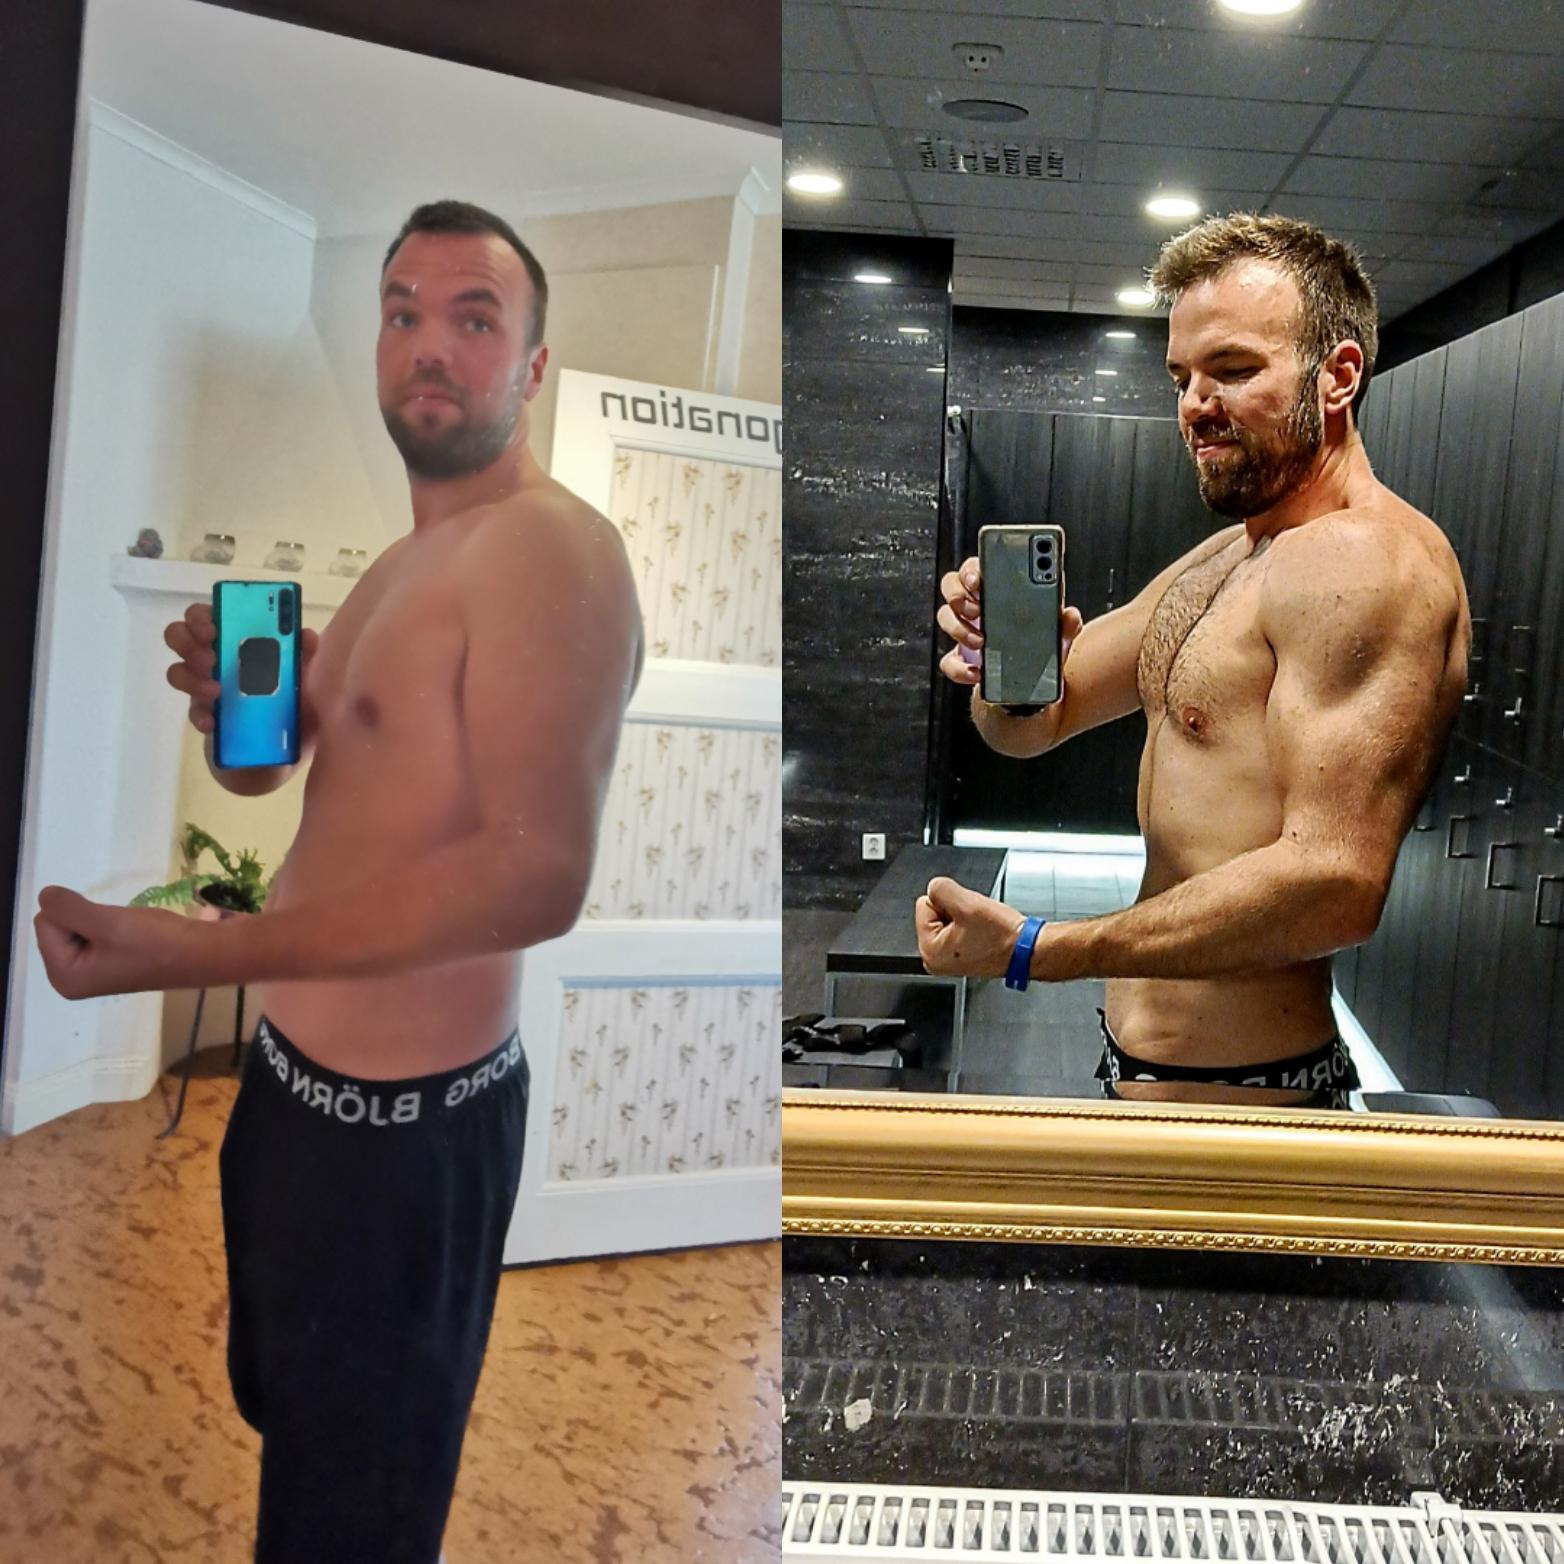 20 lbs Fat Loss 6 foot 4 Male 235 lbs to 215 lbs